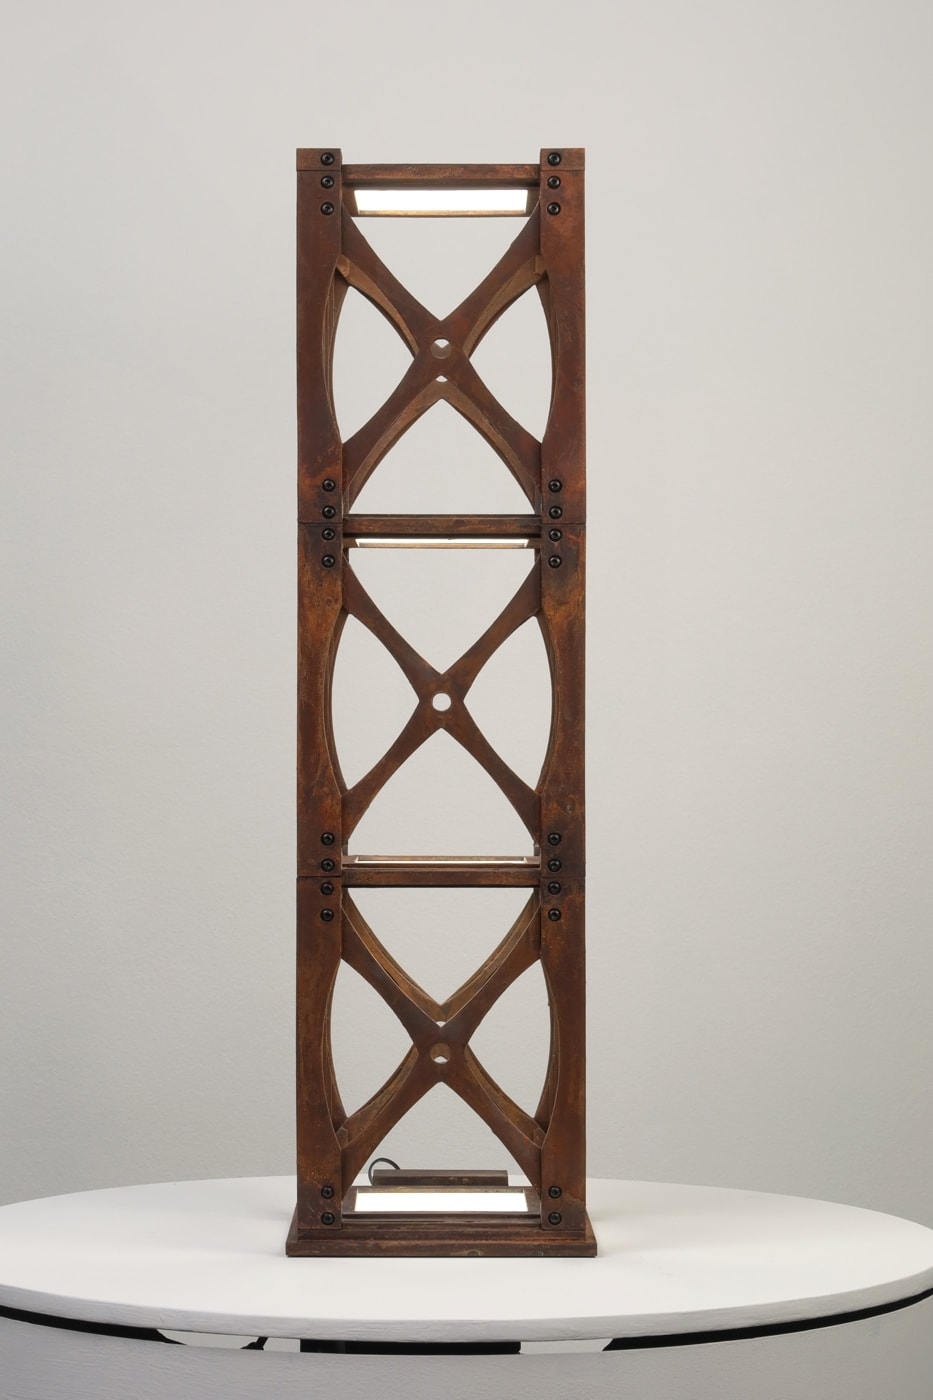 Artifact by Lumenique   OLEDWorks